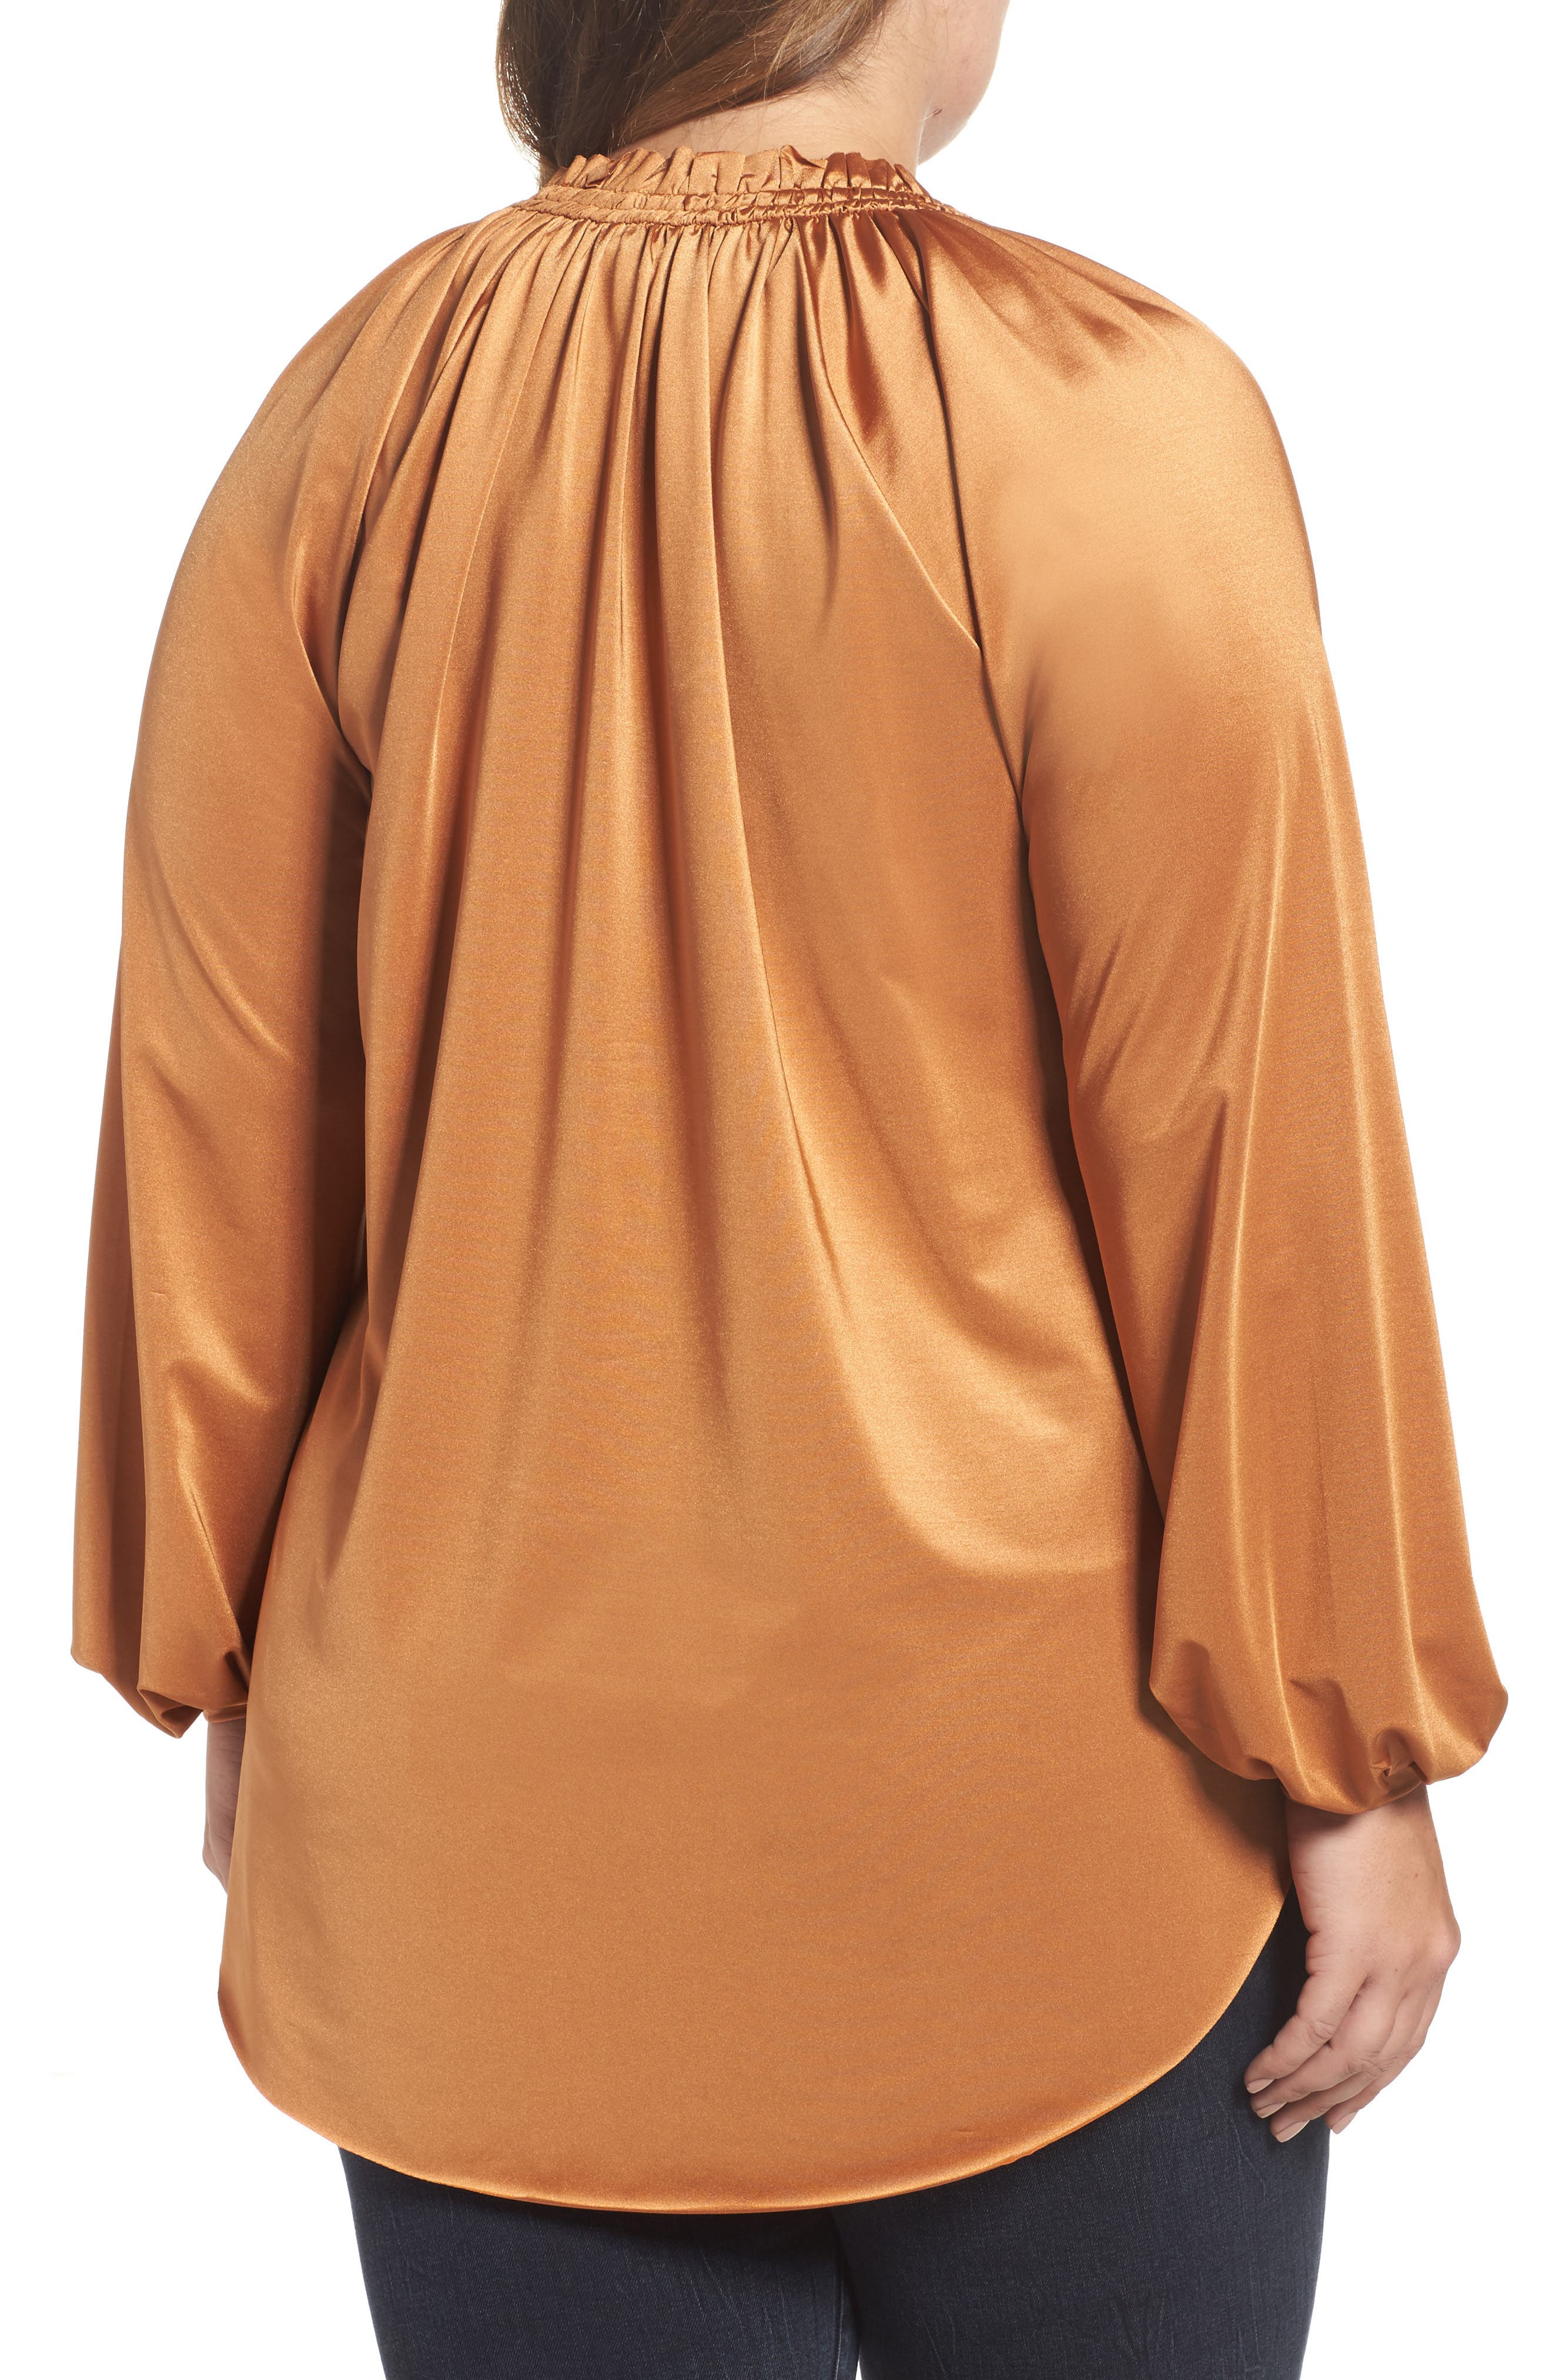 Alternate Image 2  - Melissa McCarthy Tie Neck Top (Plus Size)